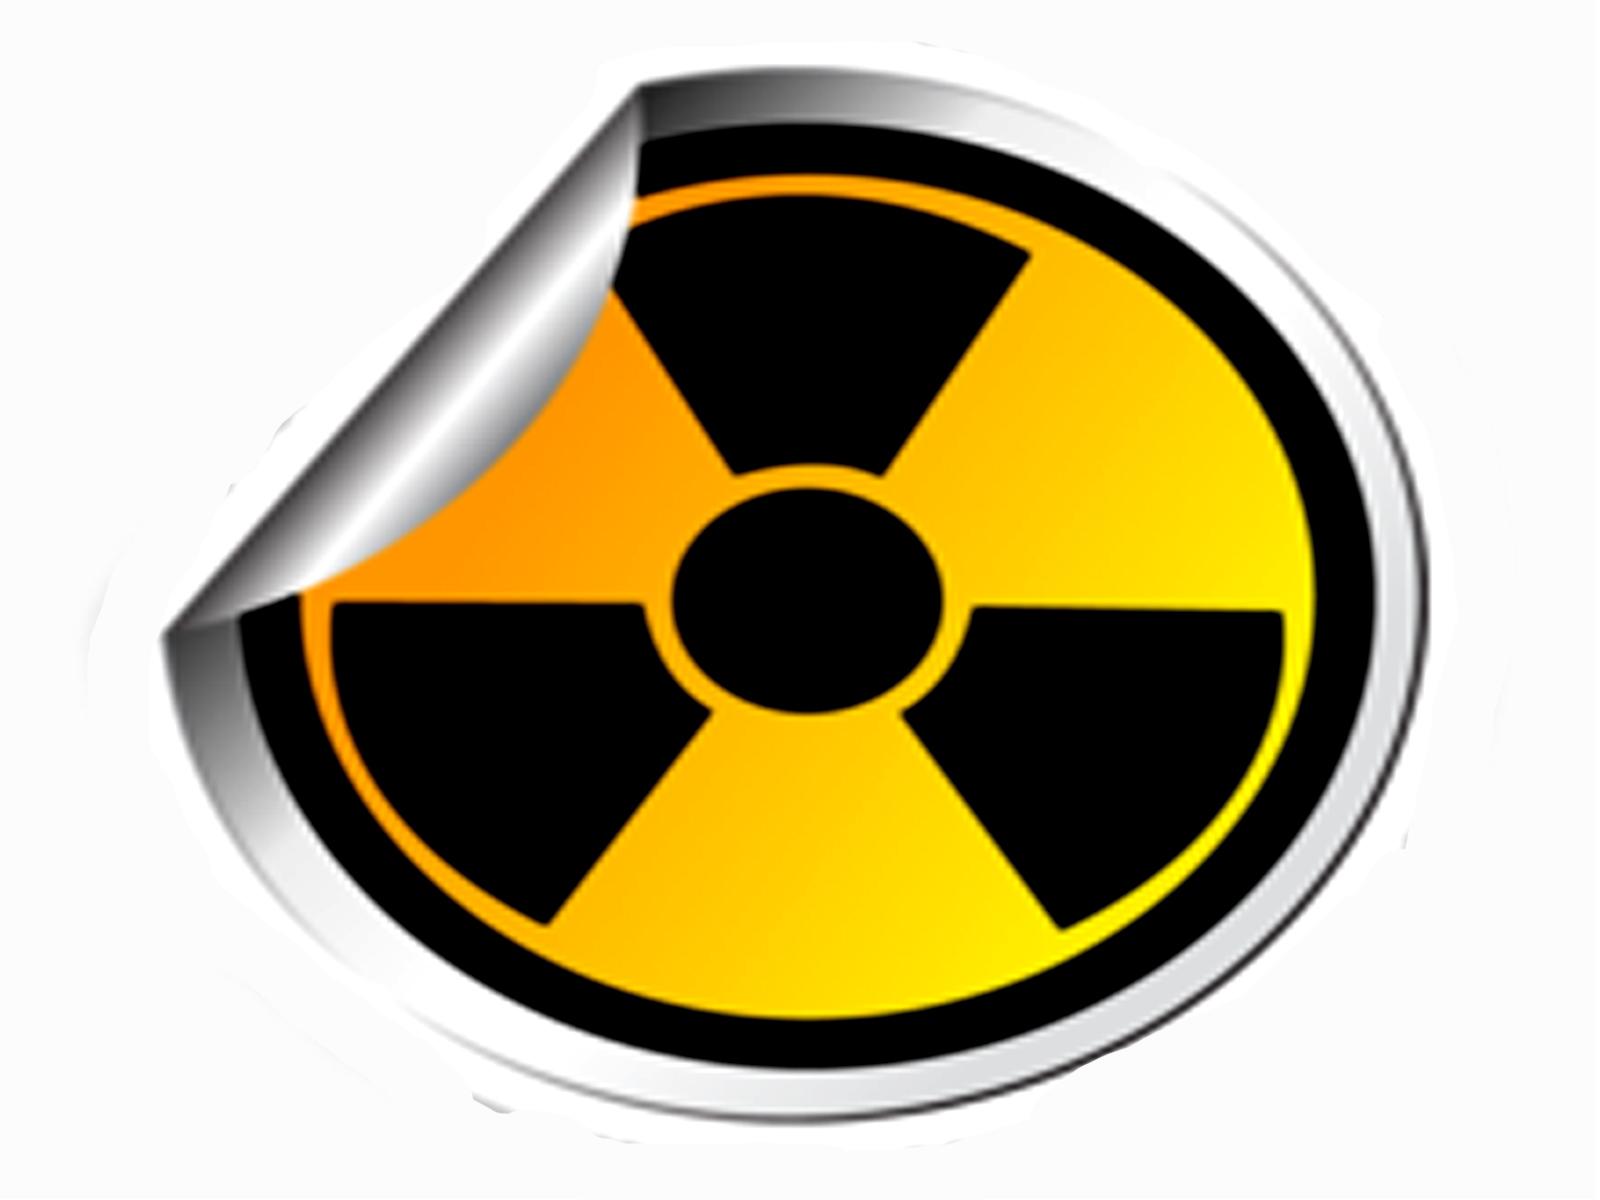 Radiation Hazard Symbol HD Wallpaper| HD Wallpapers ...